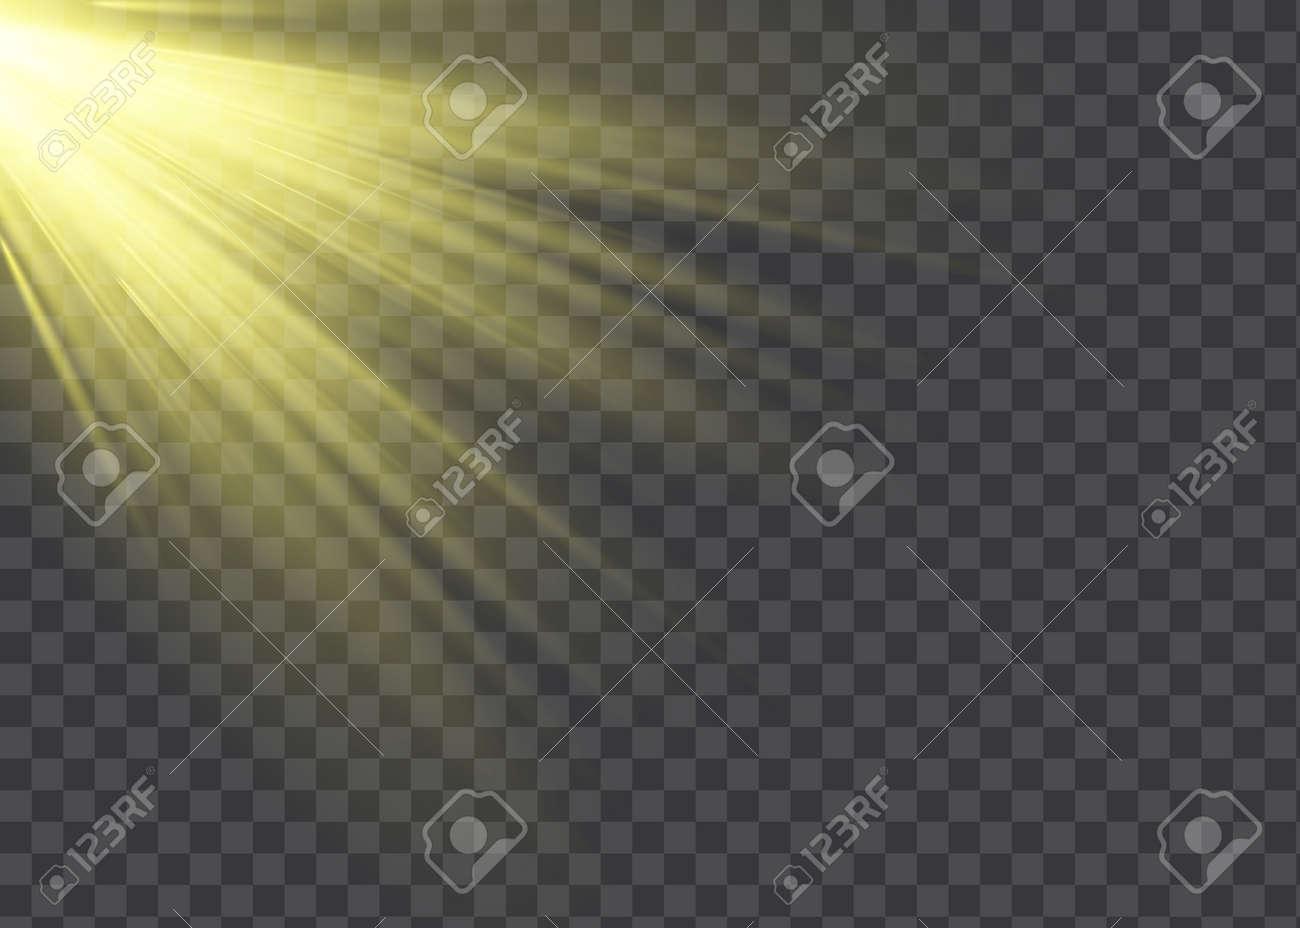 Vector transparent sunlight special lens flash light effect - 169116565